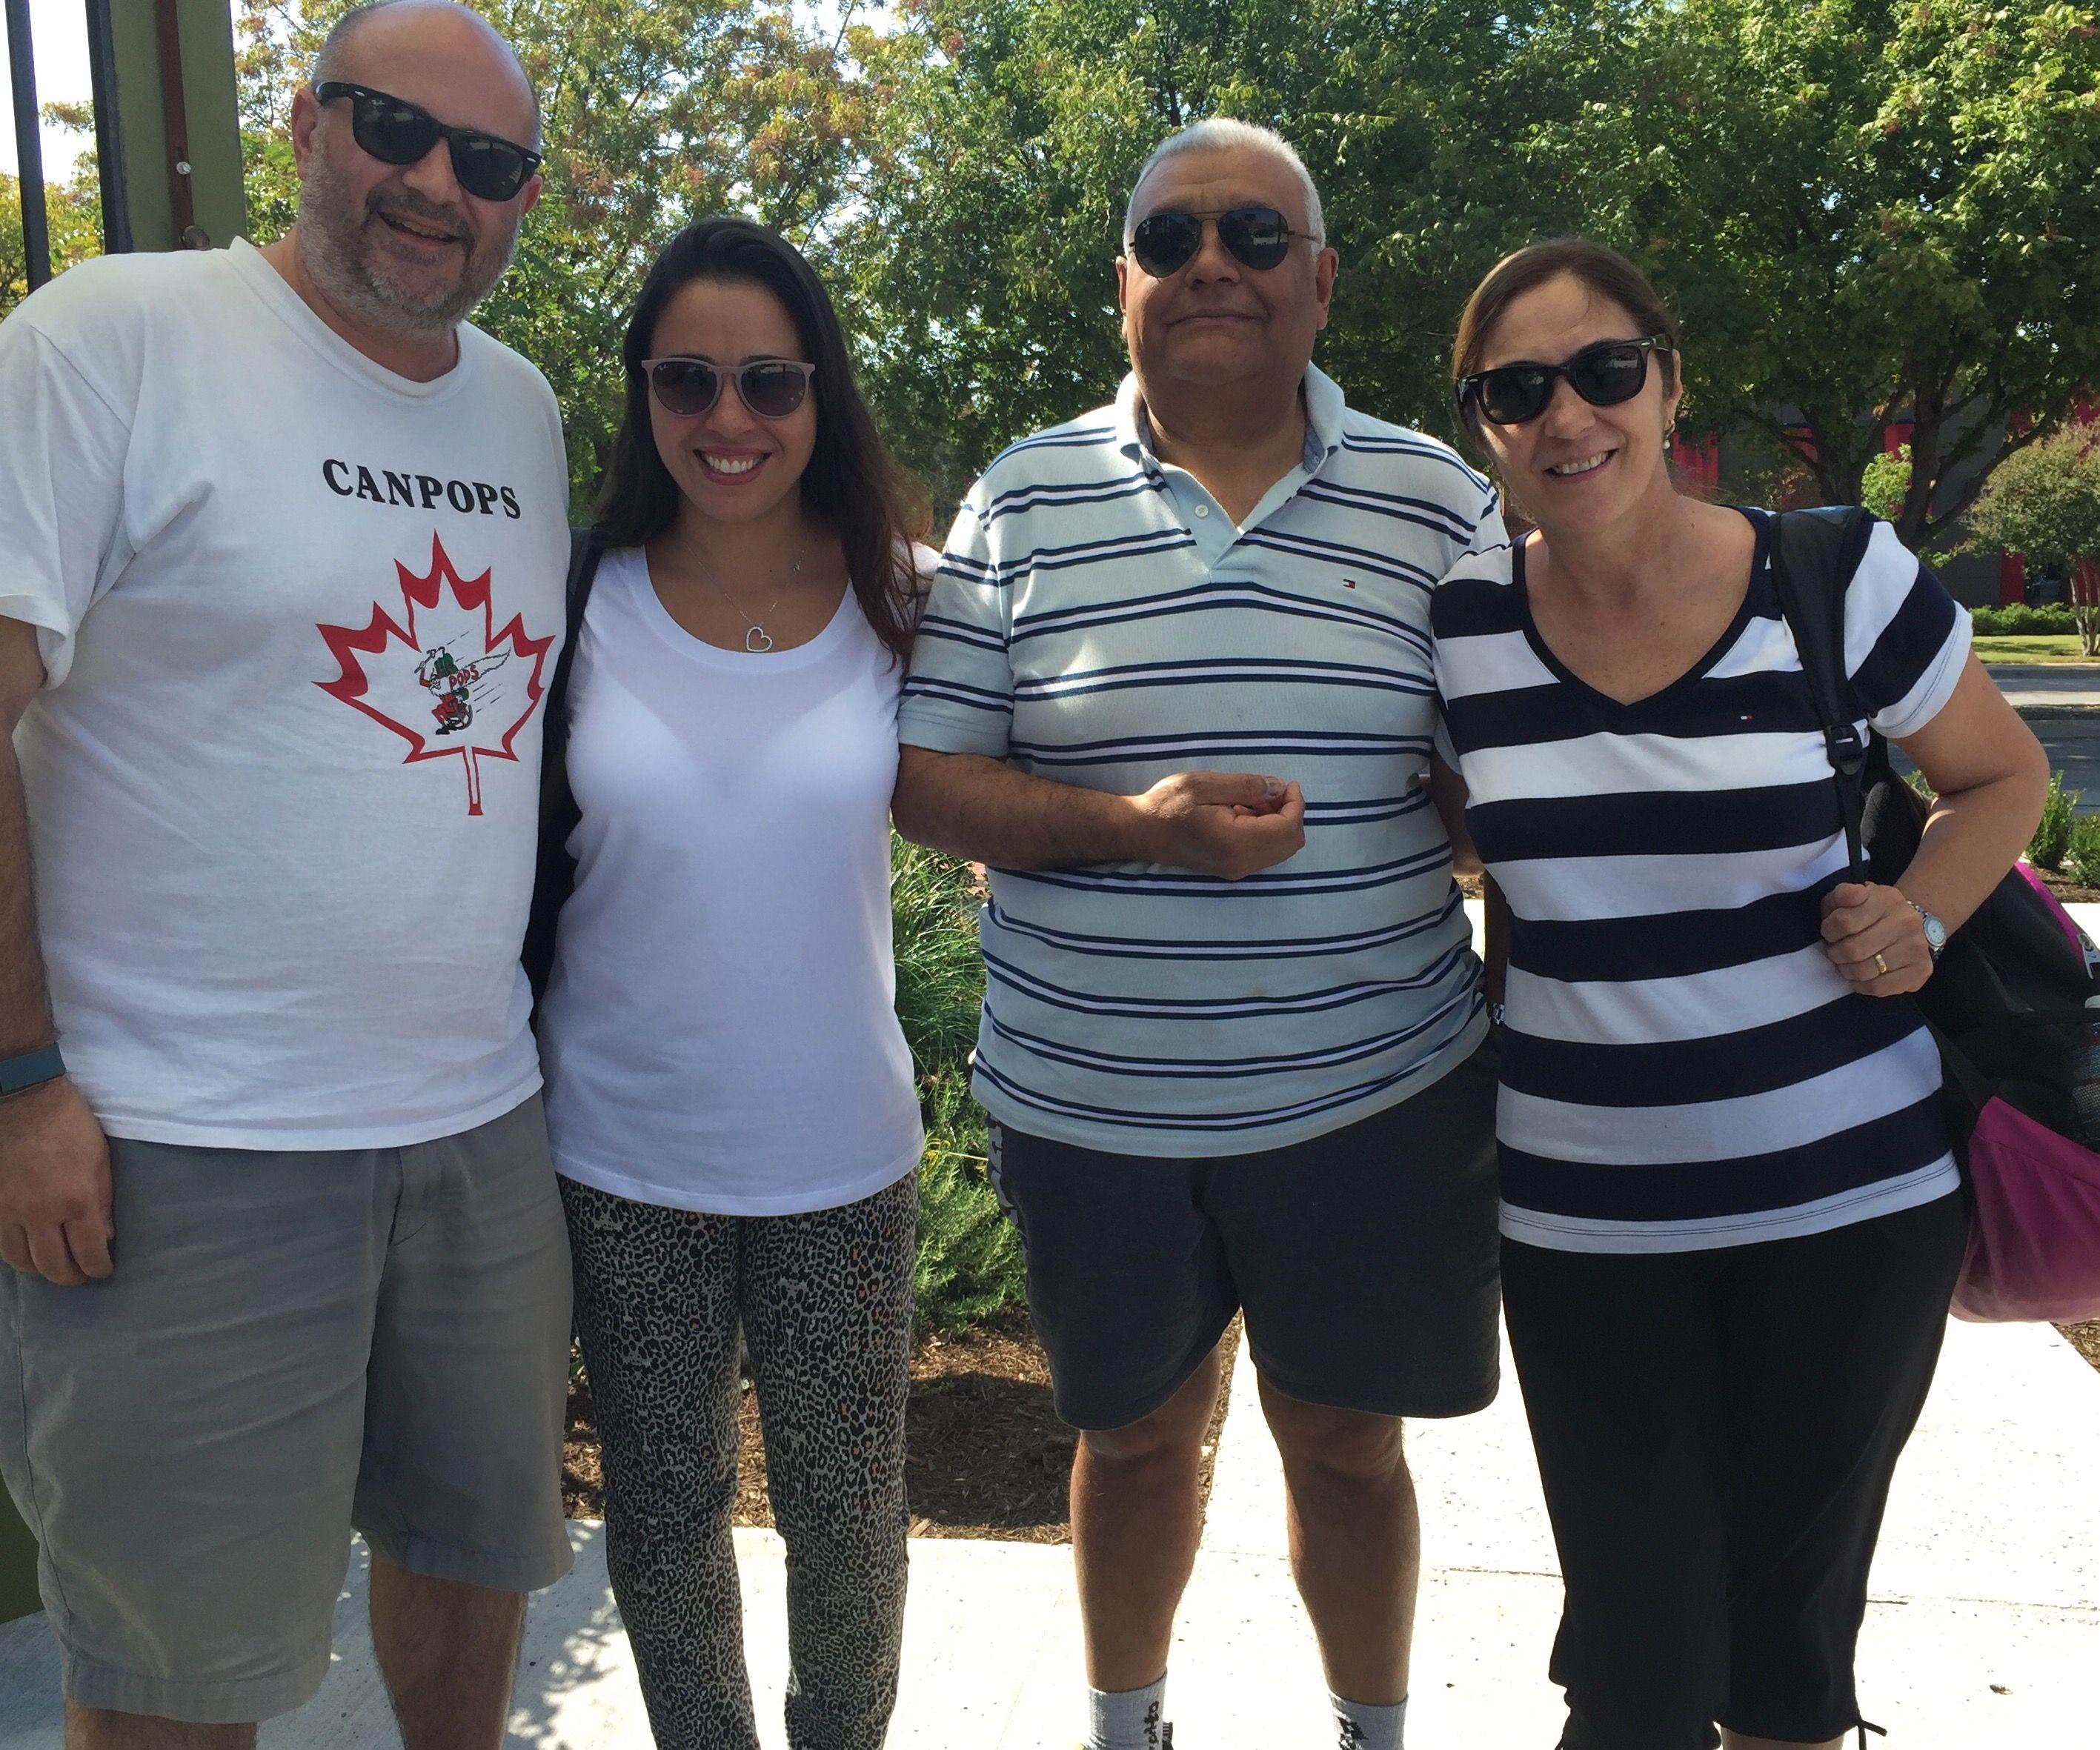 Juan, Carolina, Enrique, Alicia from SAN Juan, Argentina 10-3-16